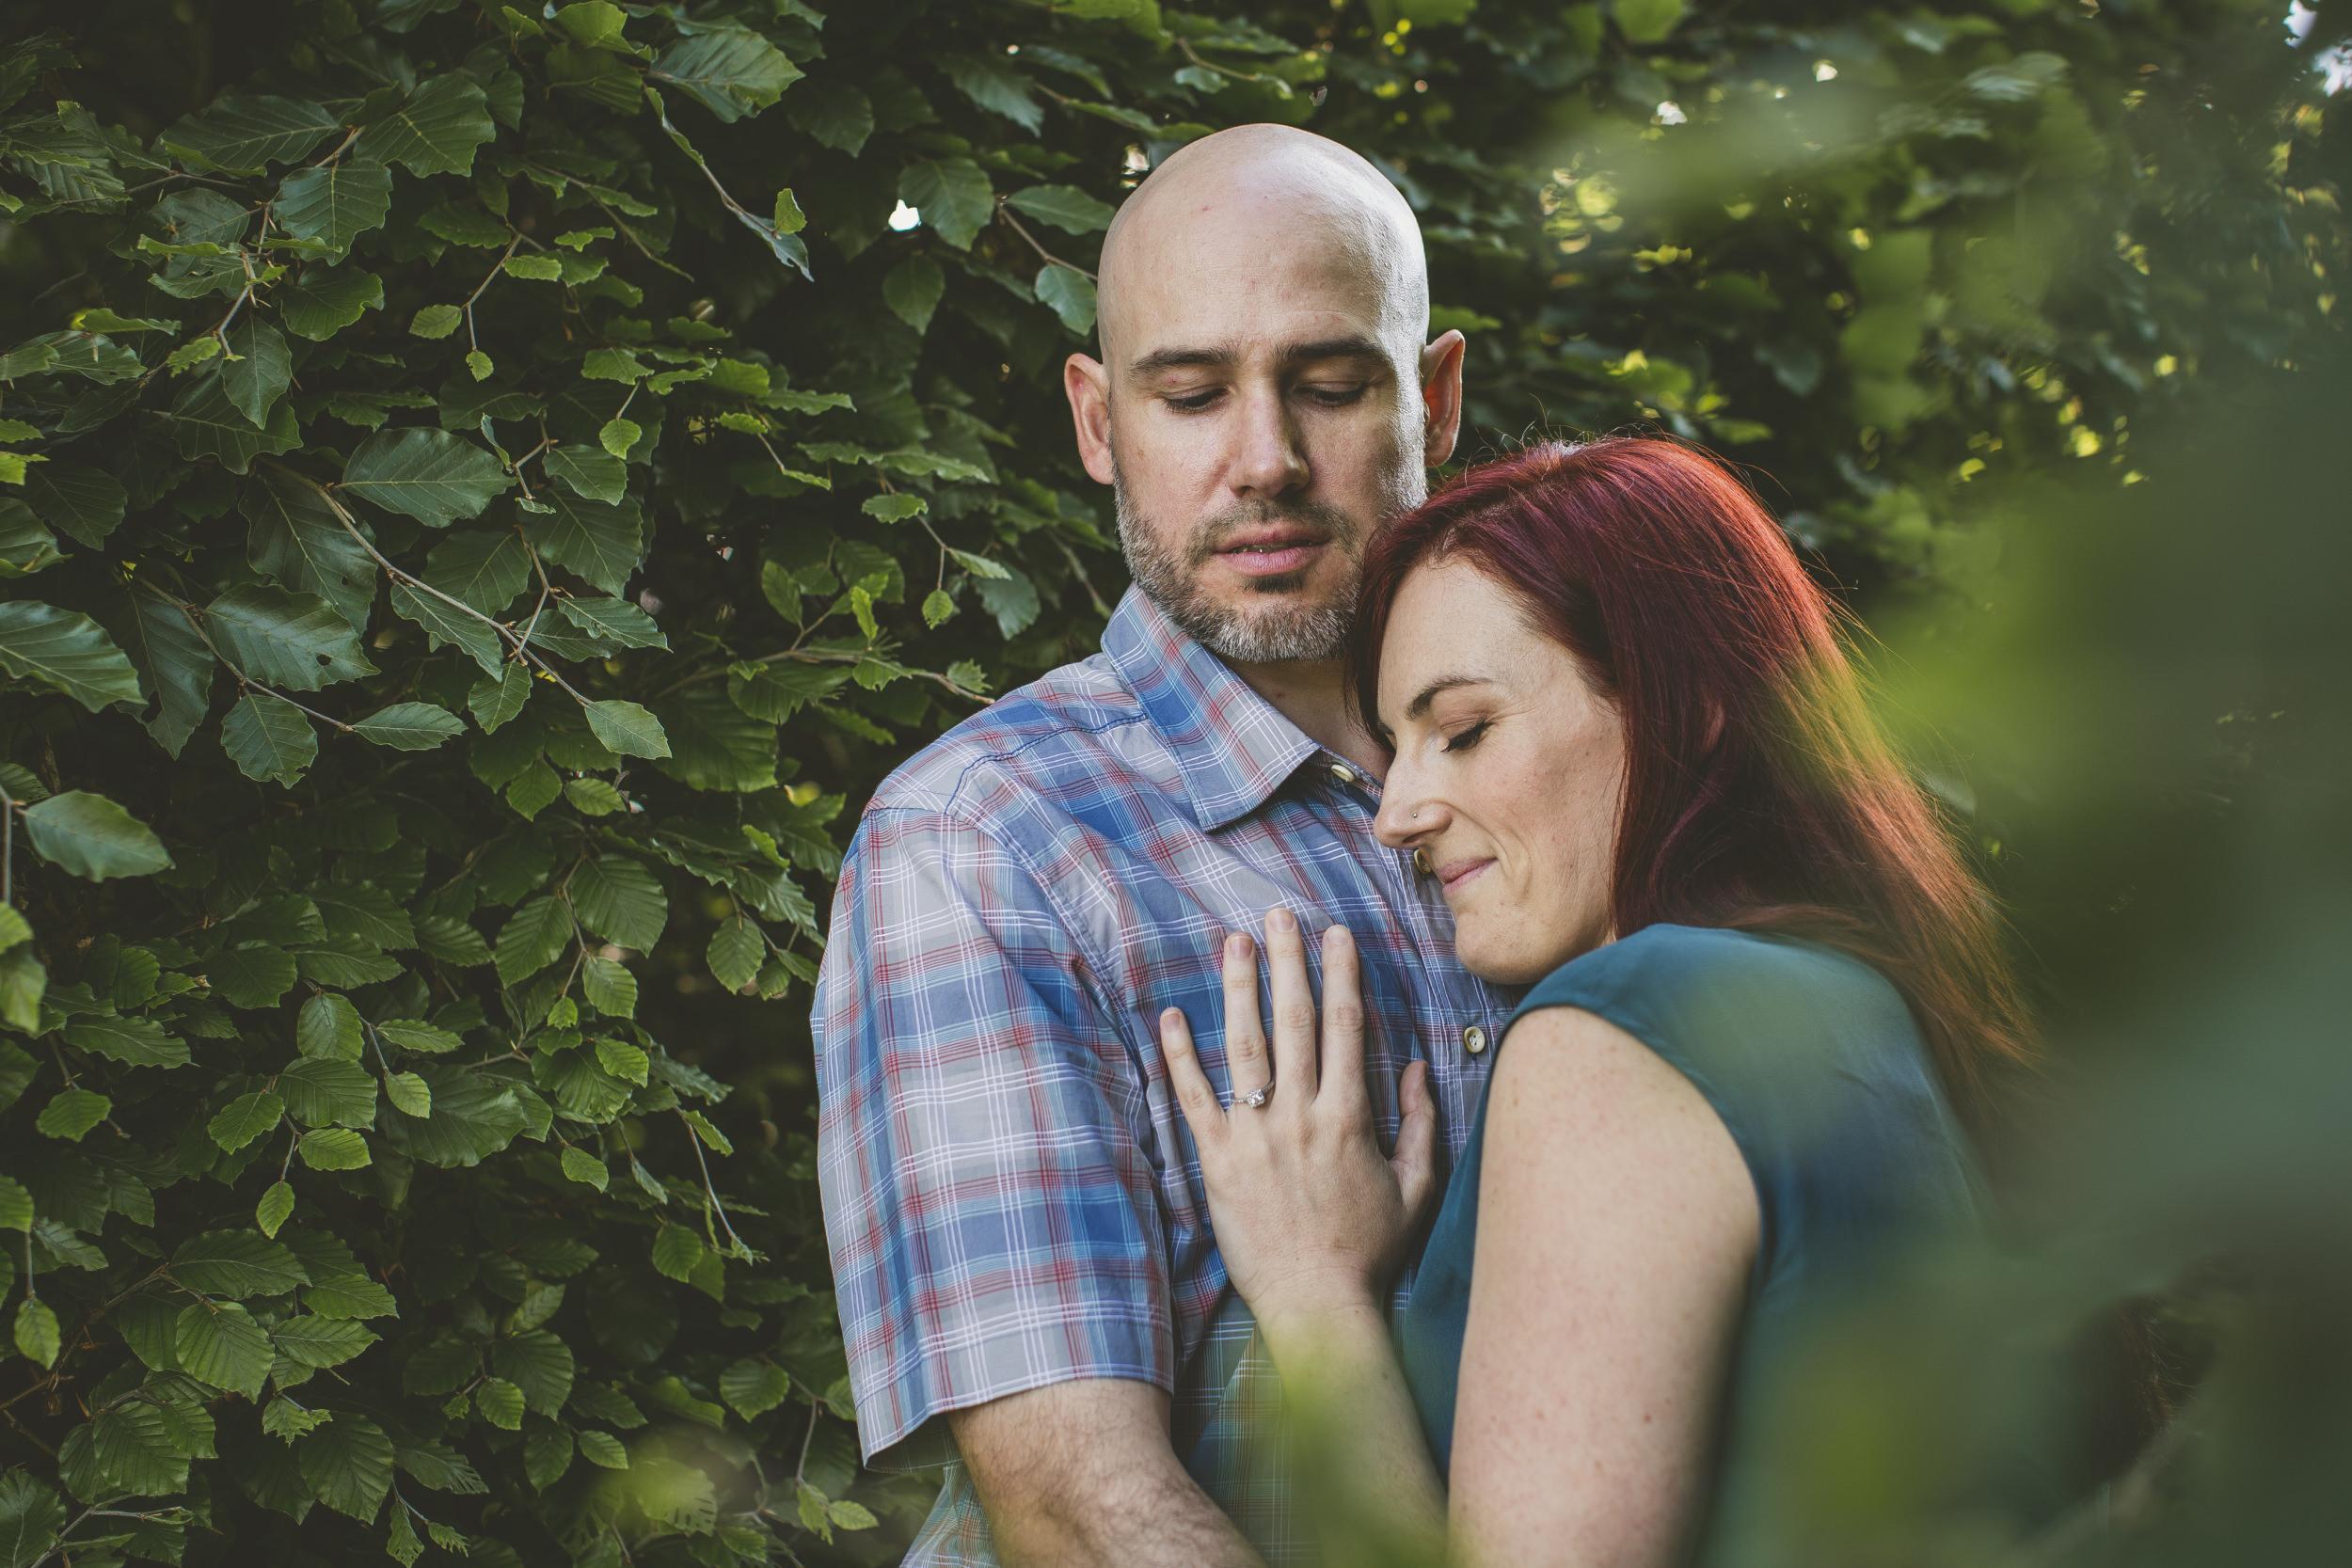 MG 1394 2 - Engagement Portfolio // Post 1 // Sarah